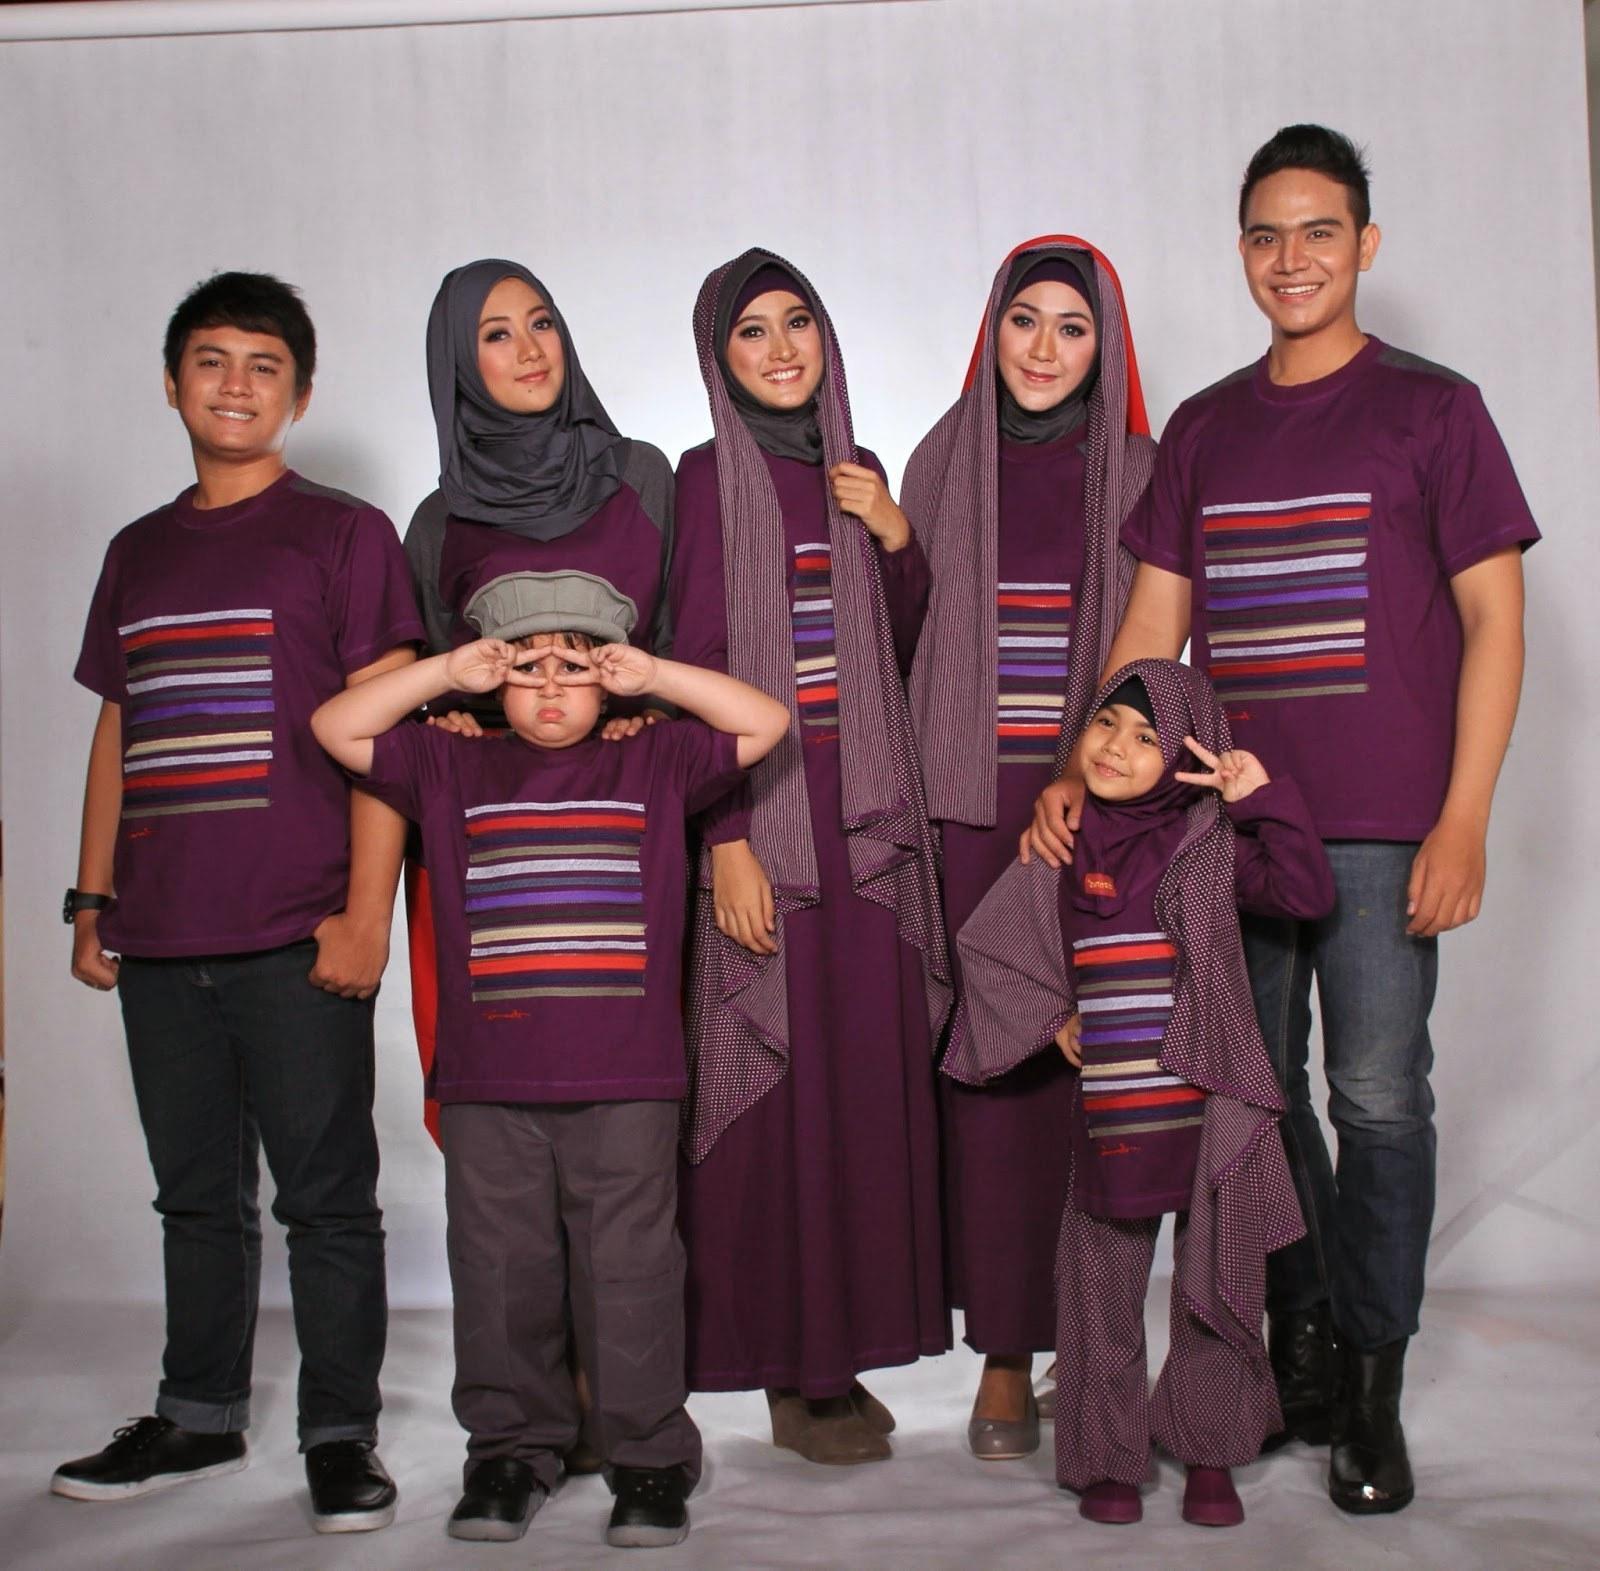 Ide Baju Lebaran 2018 Pria Ipdd Model Baju Keluarga Untuk Hari Raya Lebaran 2018